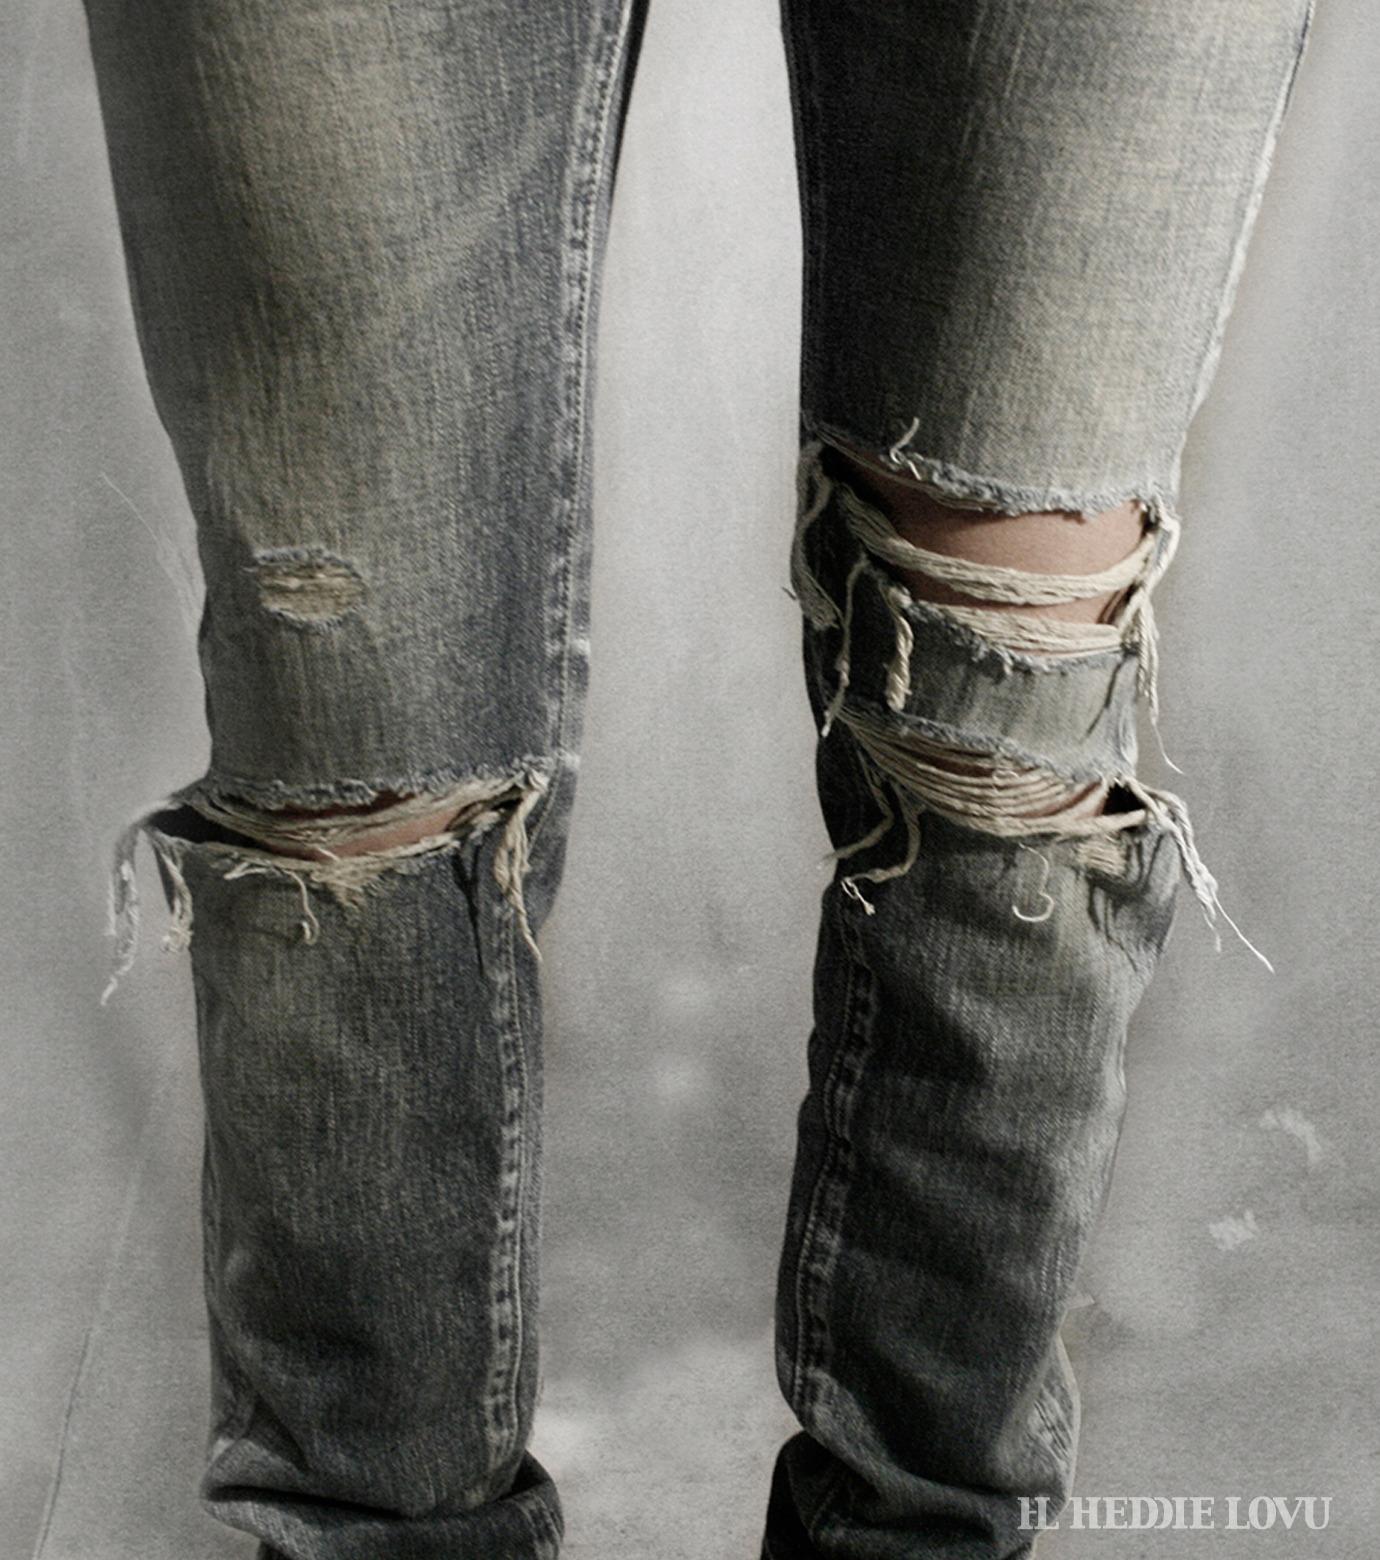 HL HEDDIE LOVU(エイチエル・エディールーヴ)のDamage Denim PT-BLUE(パンツ/pants)-17S98003-92 拡大詳細画像9